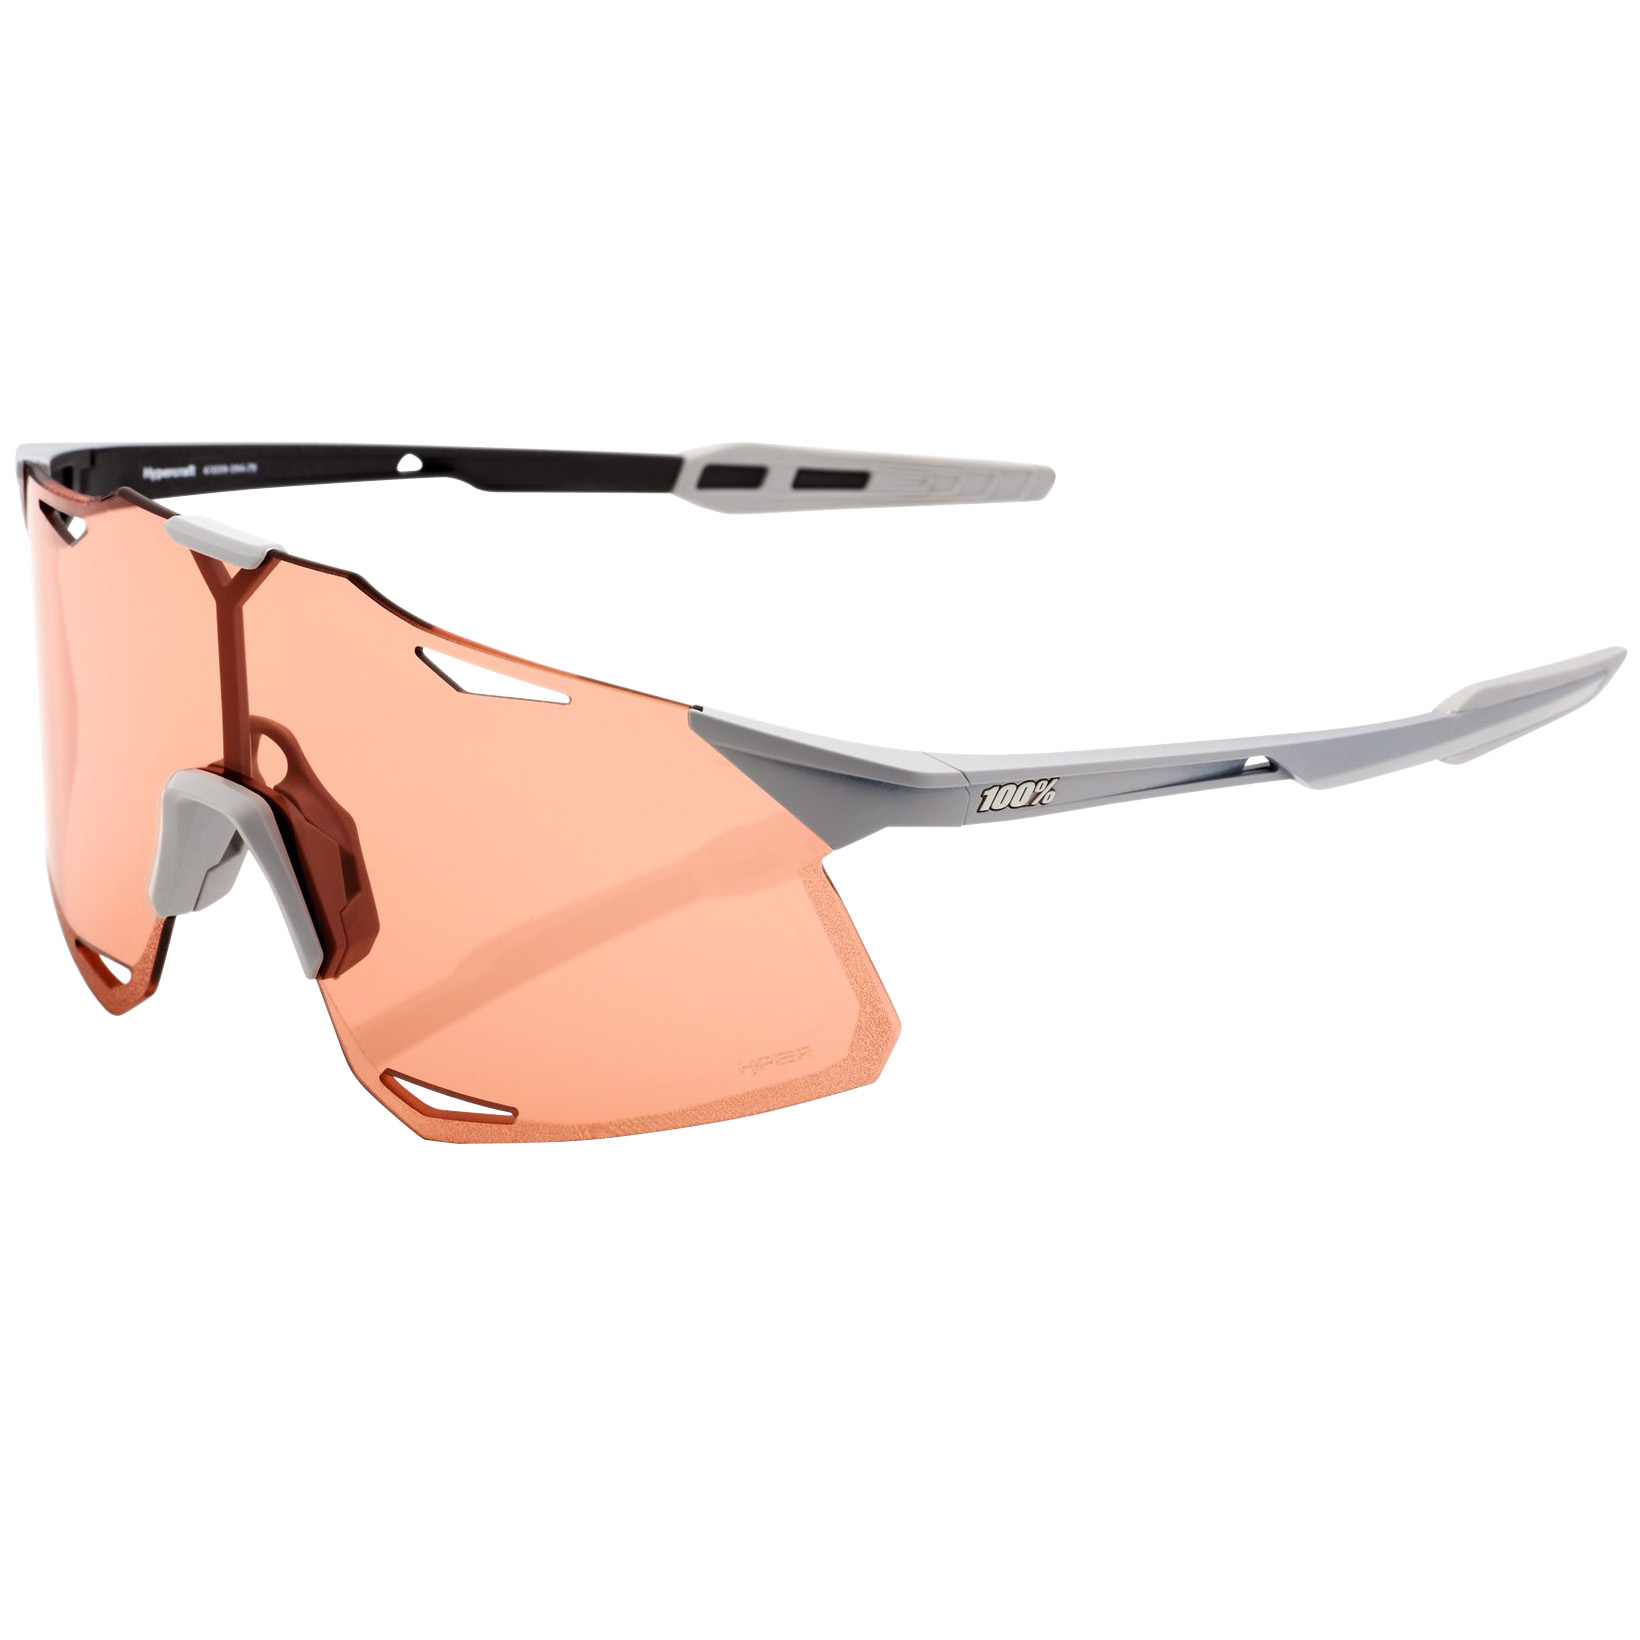 100% Hypercraft - HiPER Lens Gafas - Matte Stone Grey/Coral + Clear